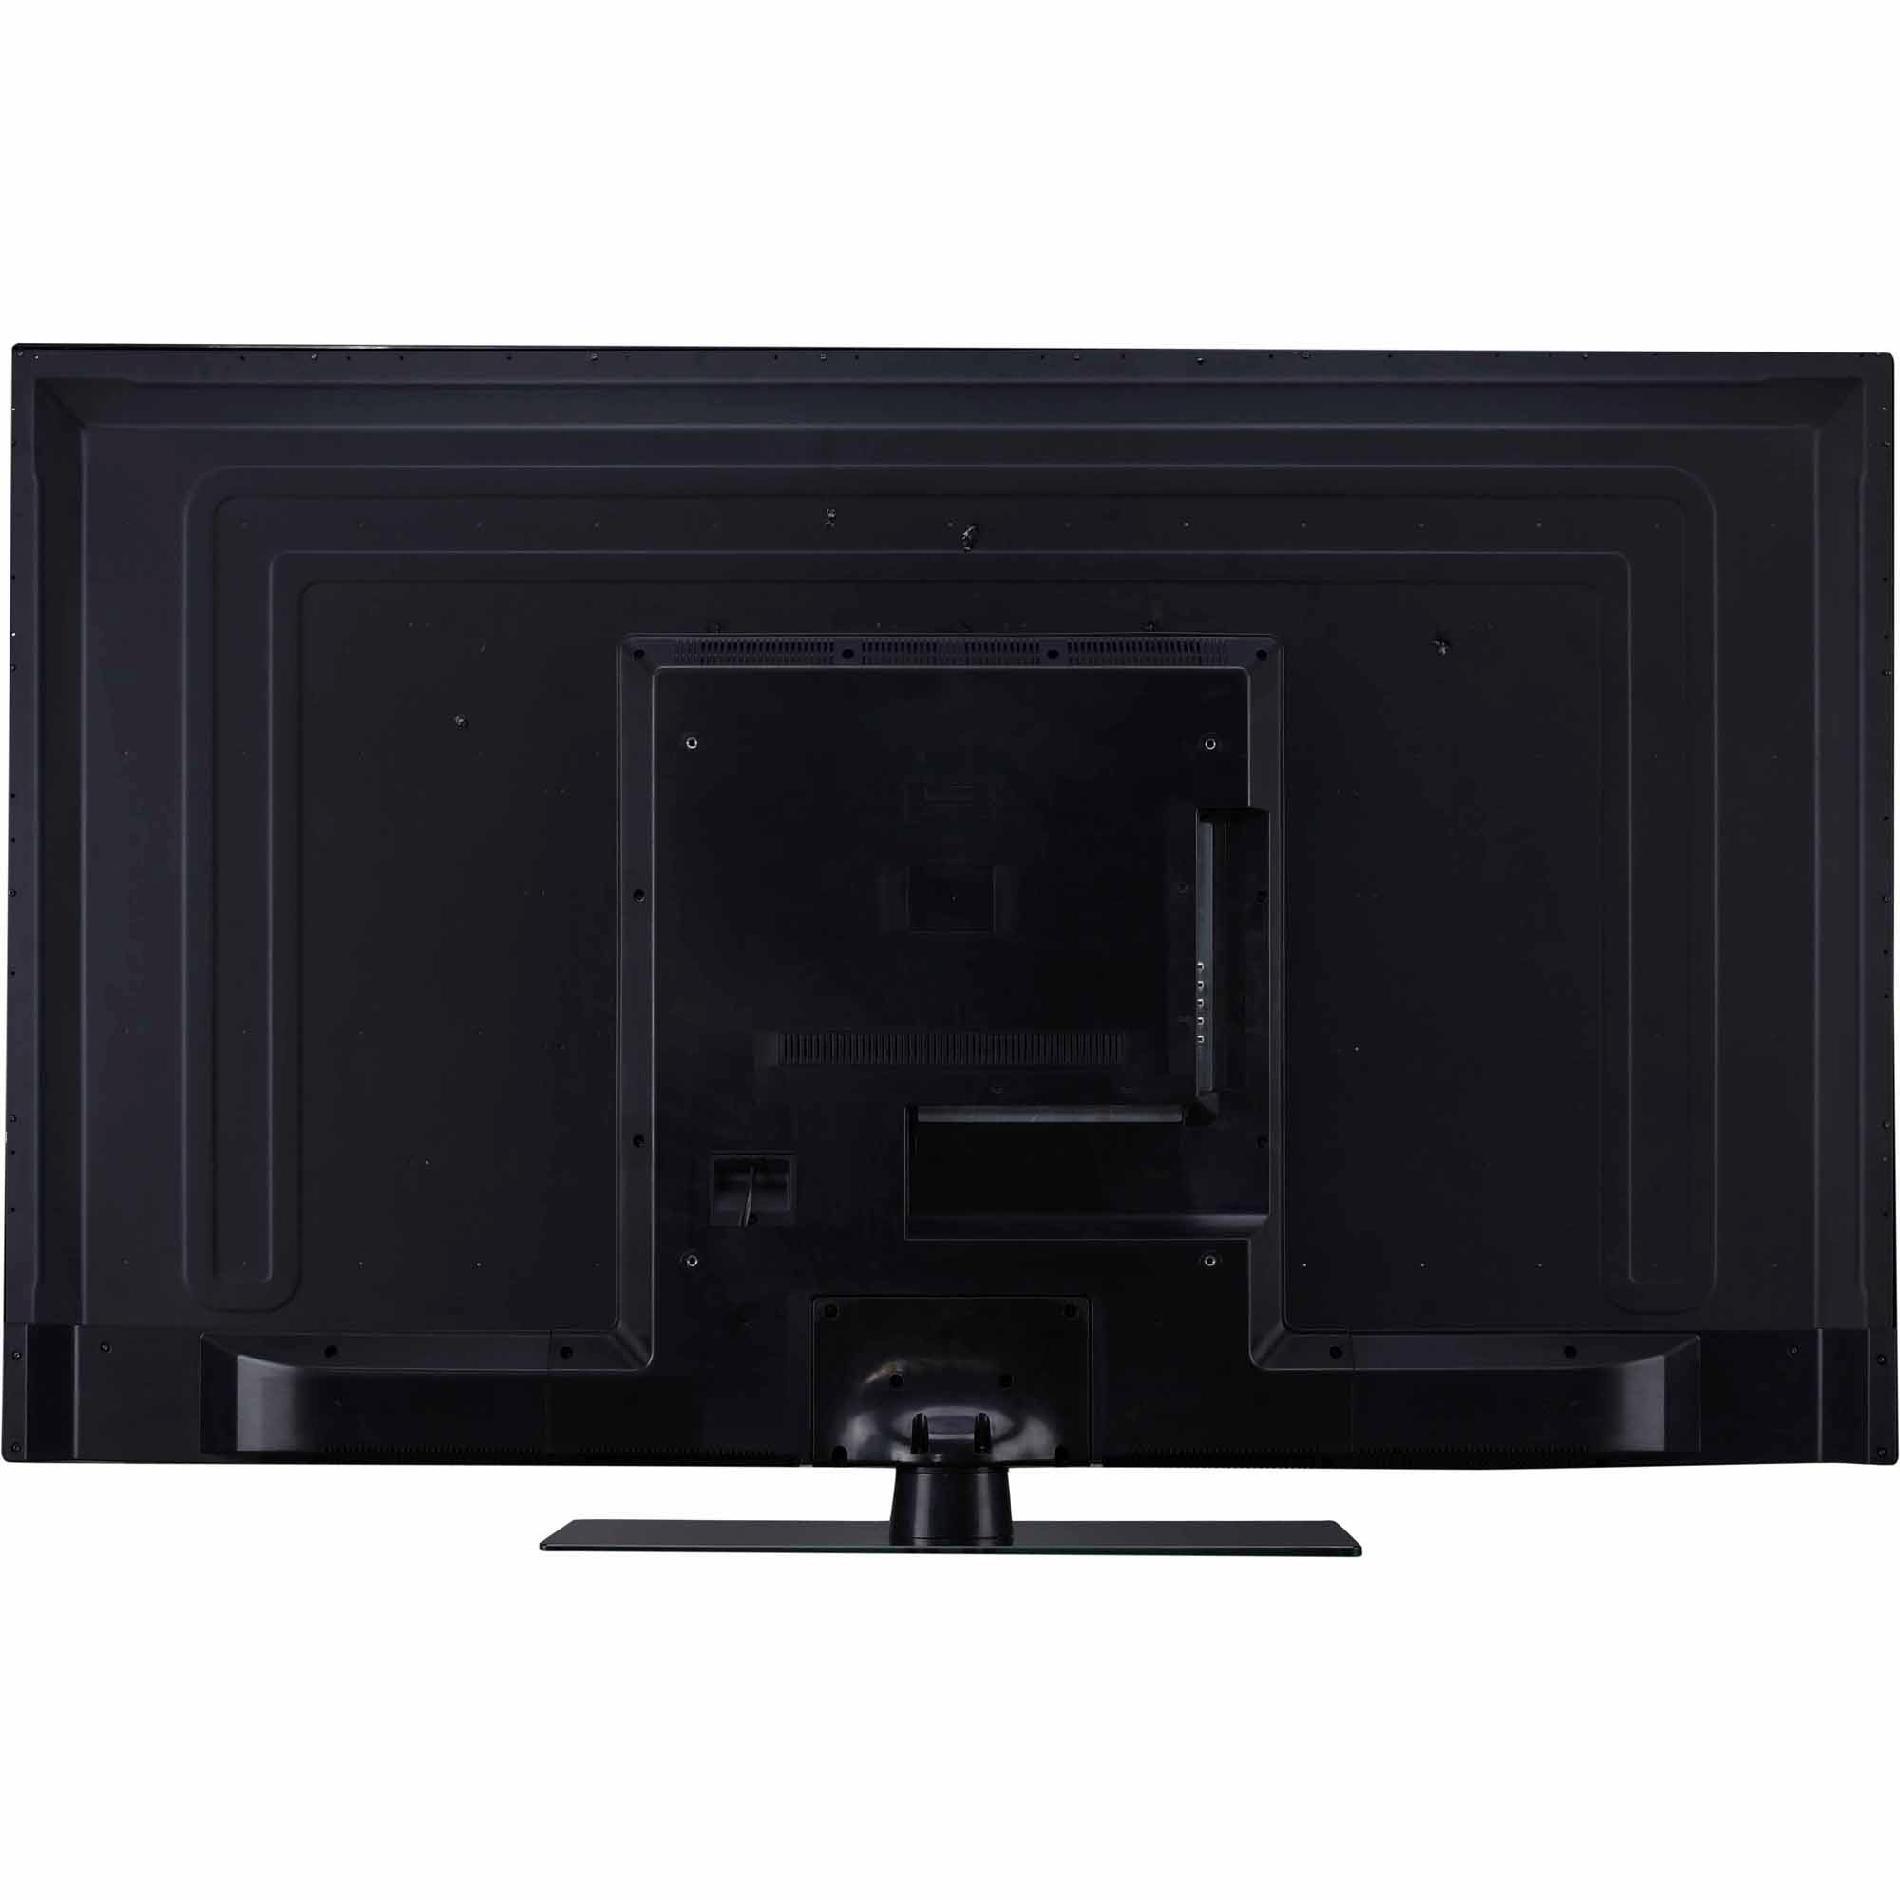 "Seiki 65"" Class 1080p 120Hz LED TV - SE65GY25"